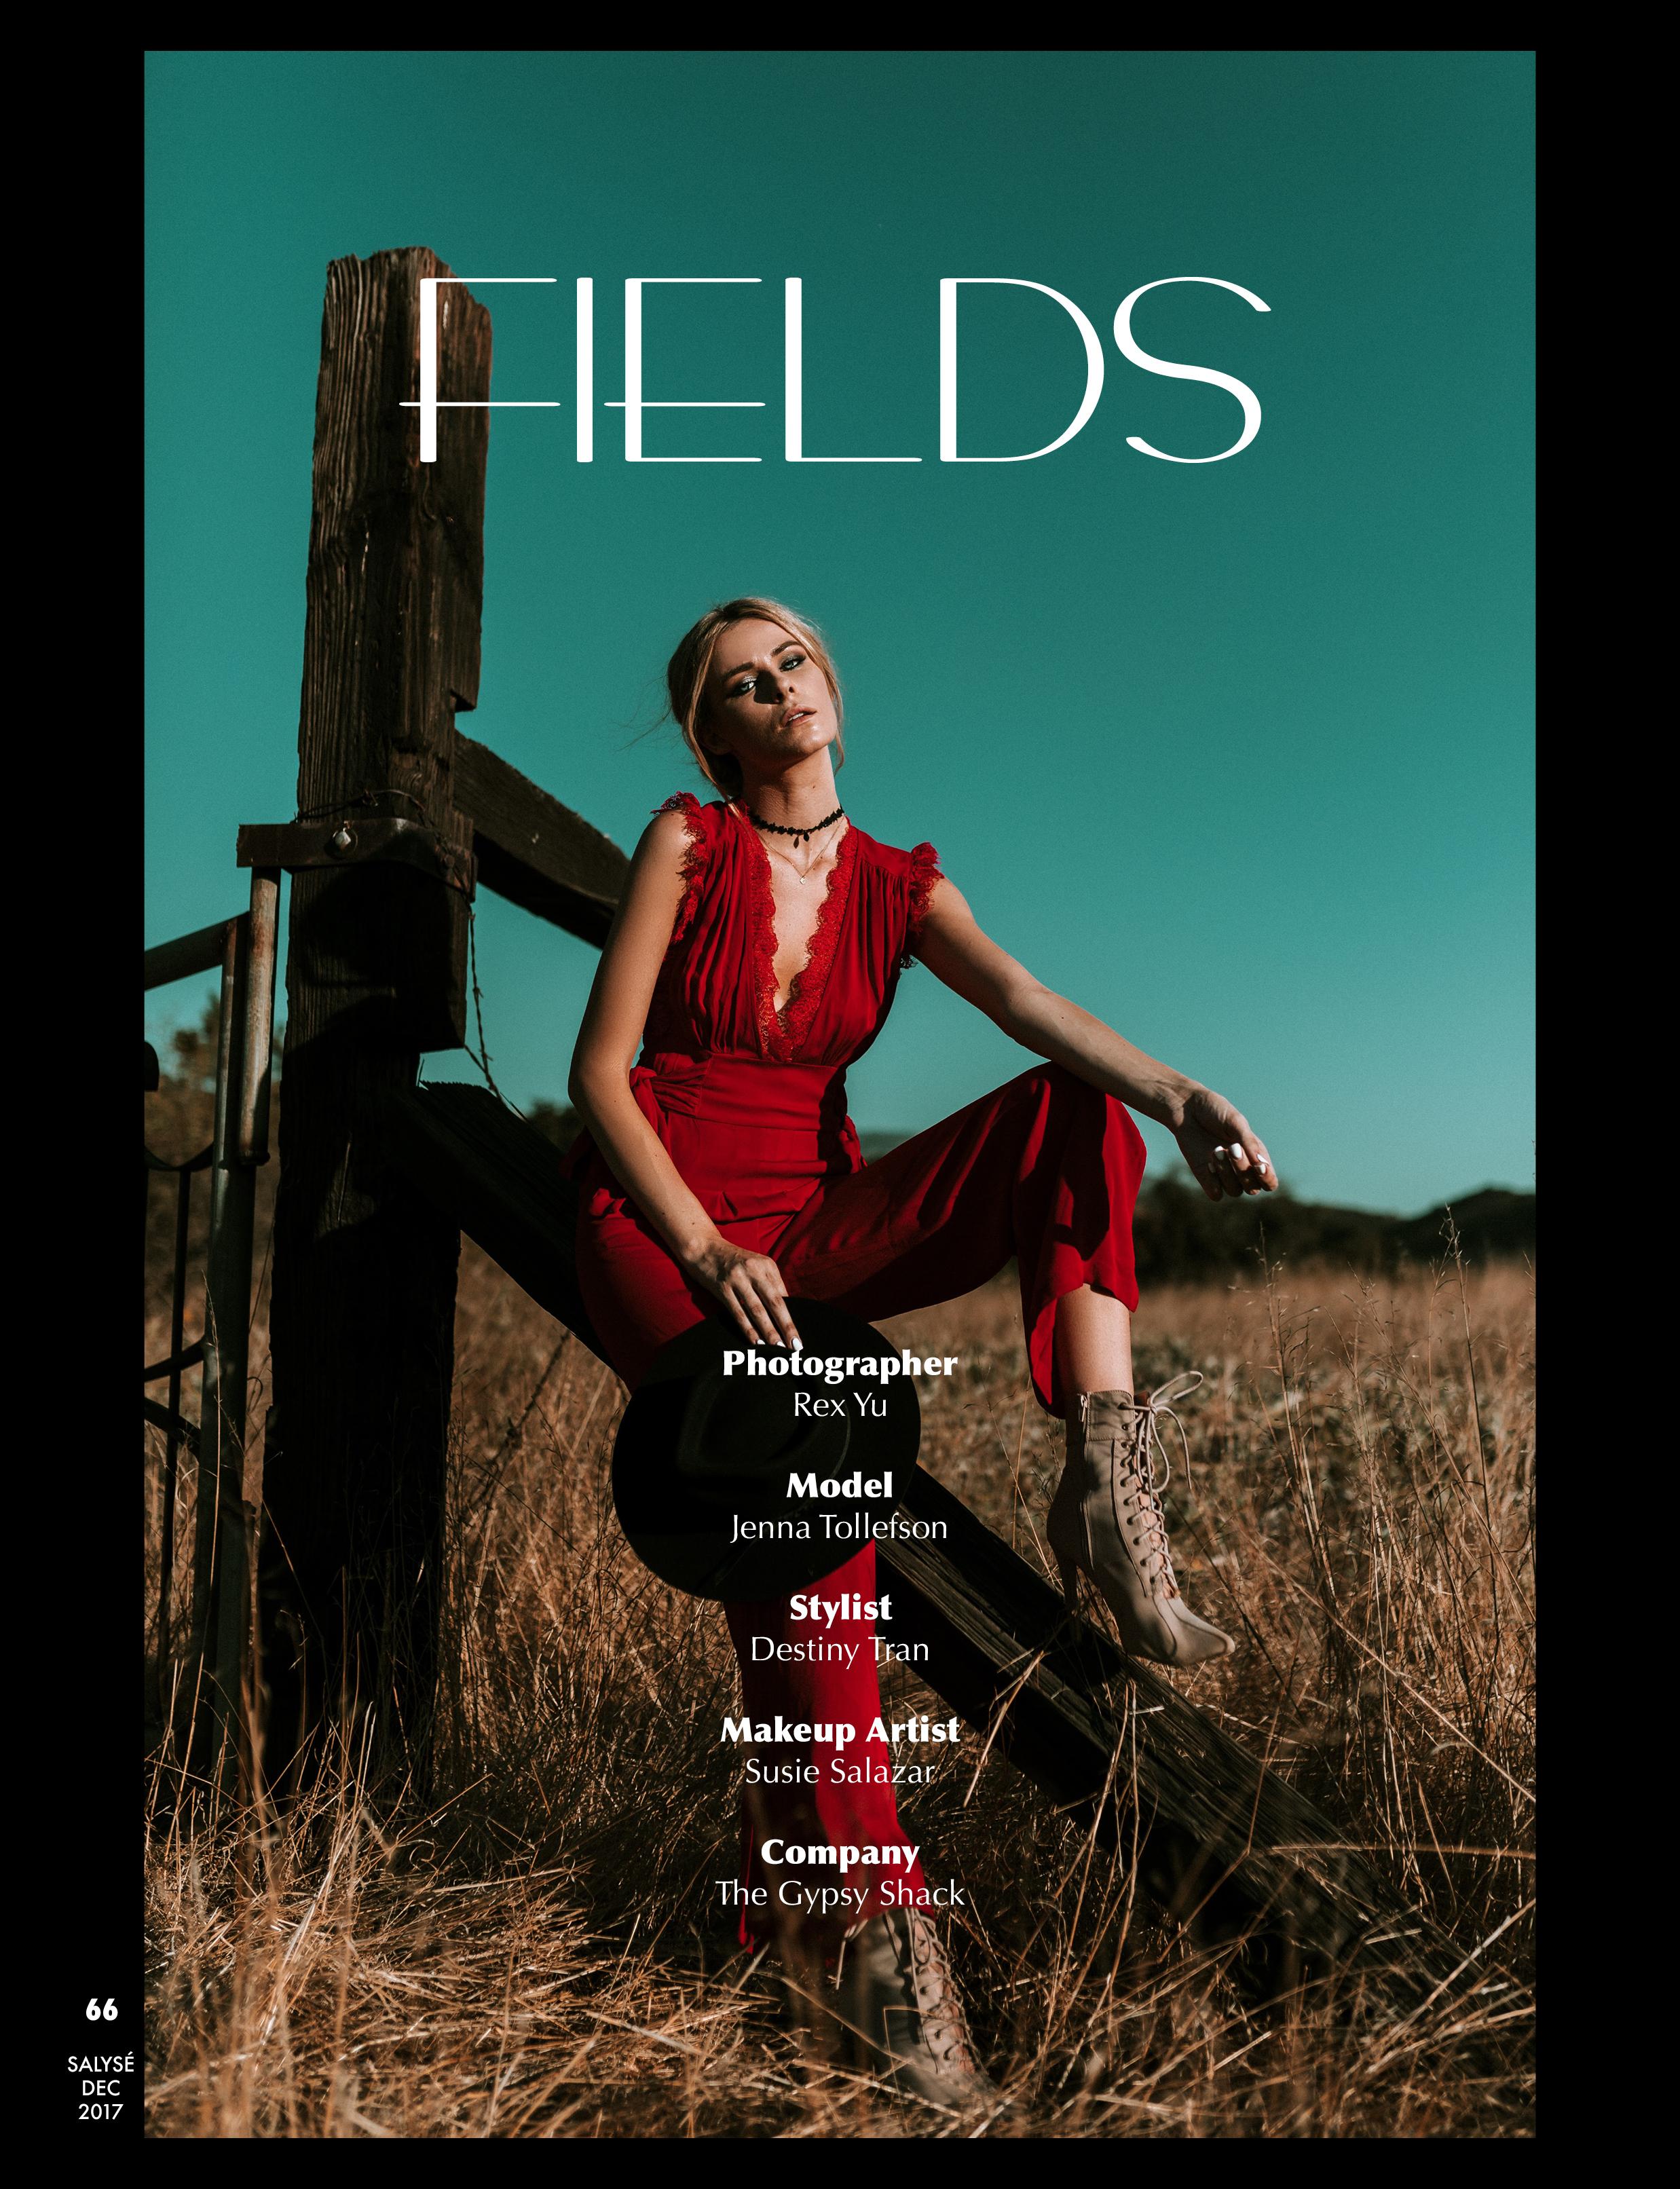 'Fields' - for Salyse MagazineFebruary 2018 Edition